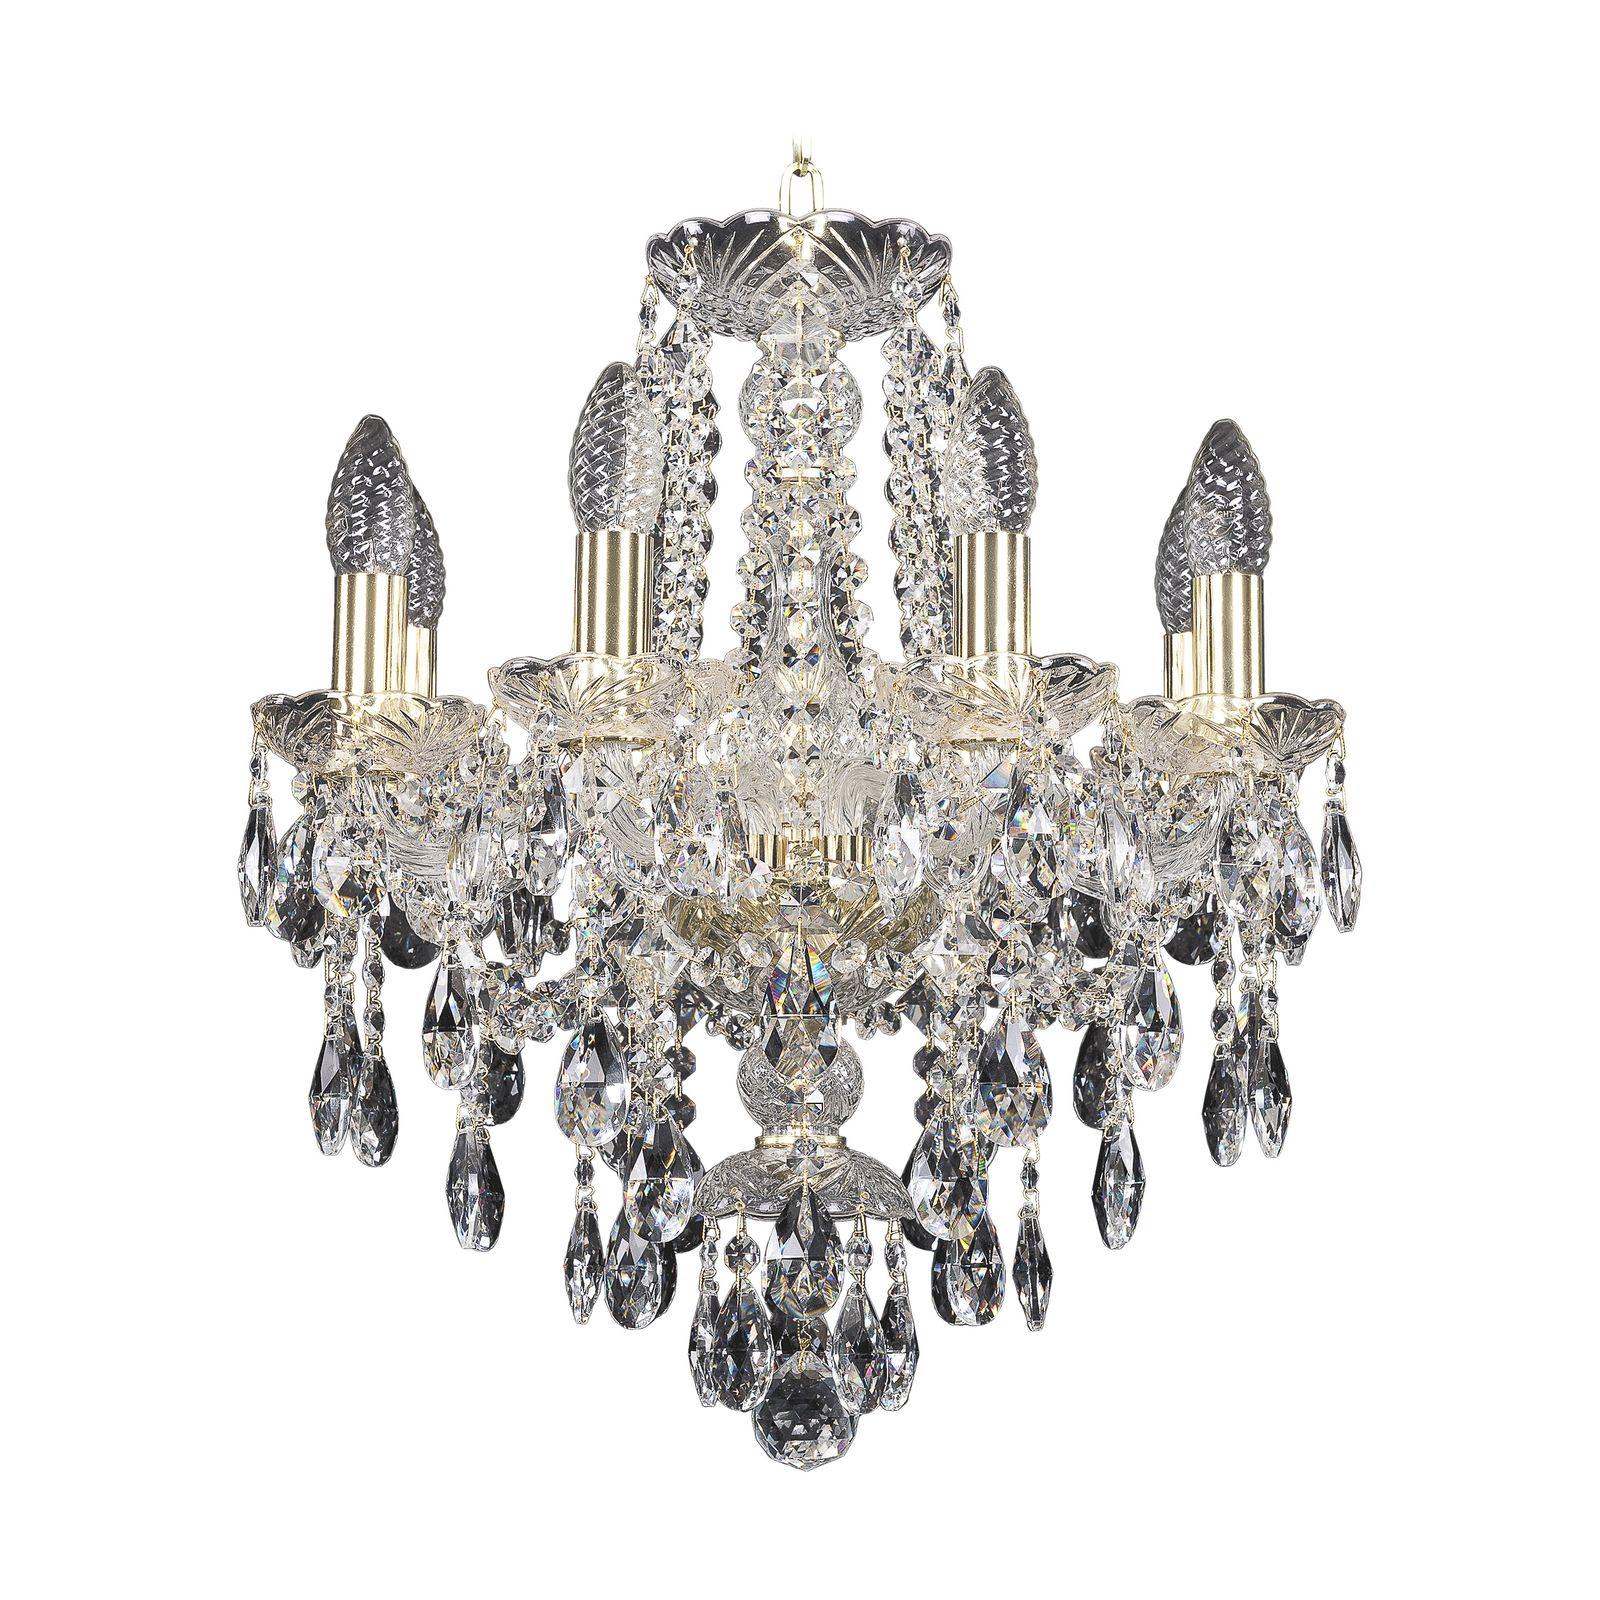 Потолочный светильник Bohemia Ivele Crystal 1415/6/200 G, E14, 40 Вт bohemia ivele crystal 1932 75z g